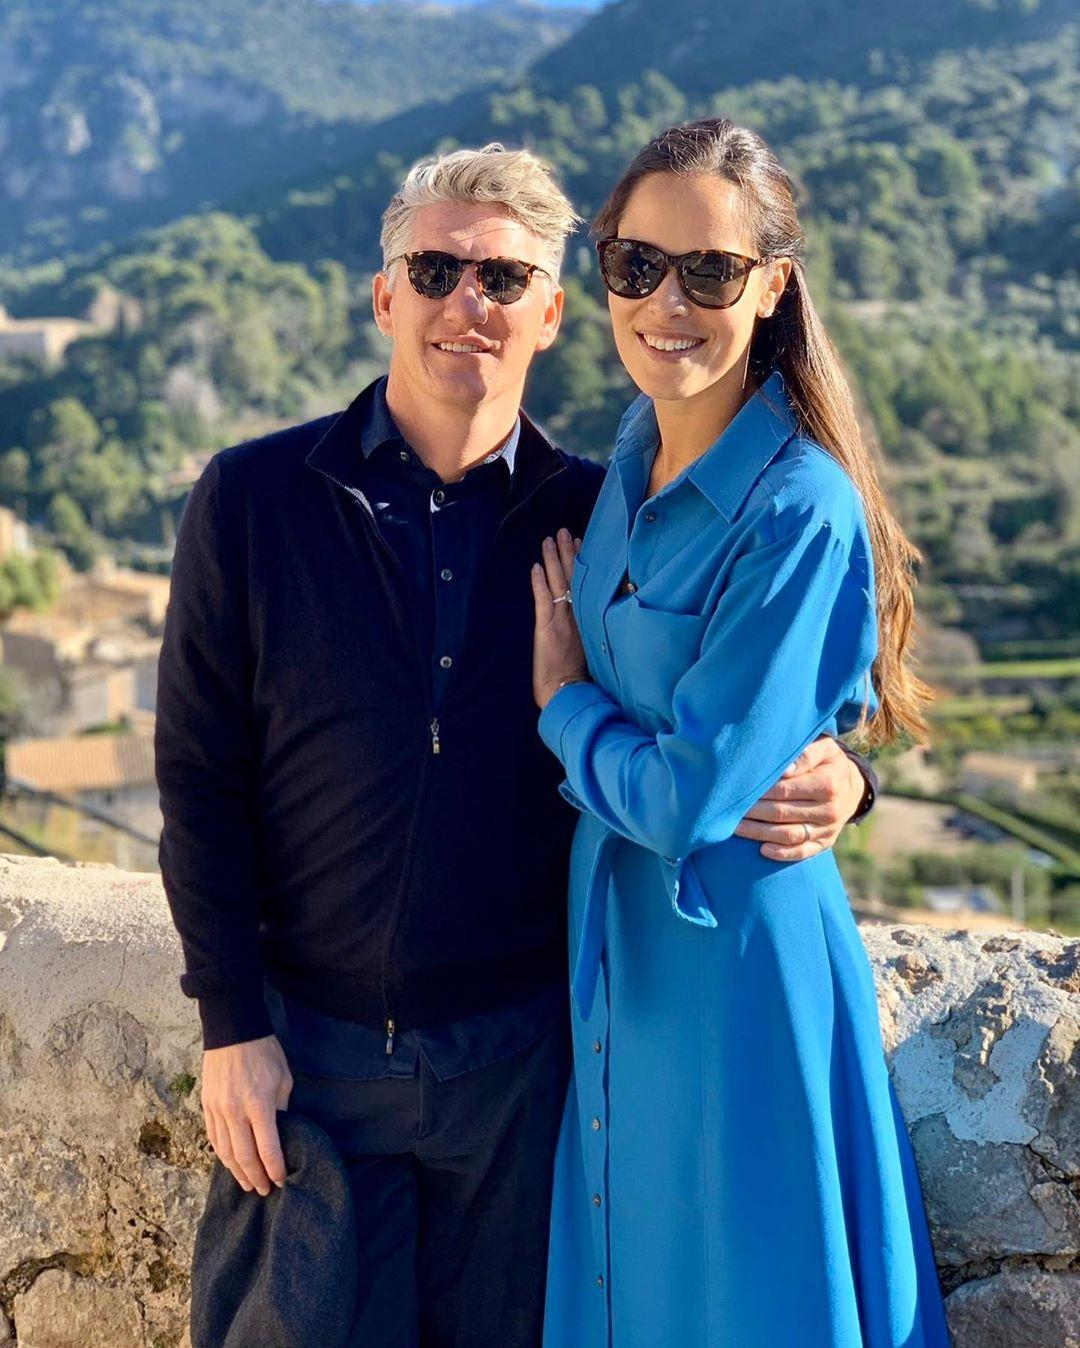 Ana Ivanovic, and her husband, former German soccer player Bastian Schweinsteiger